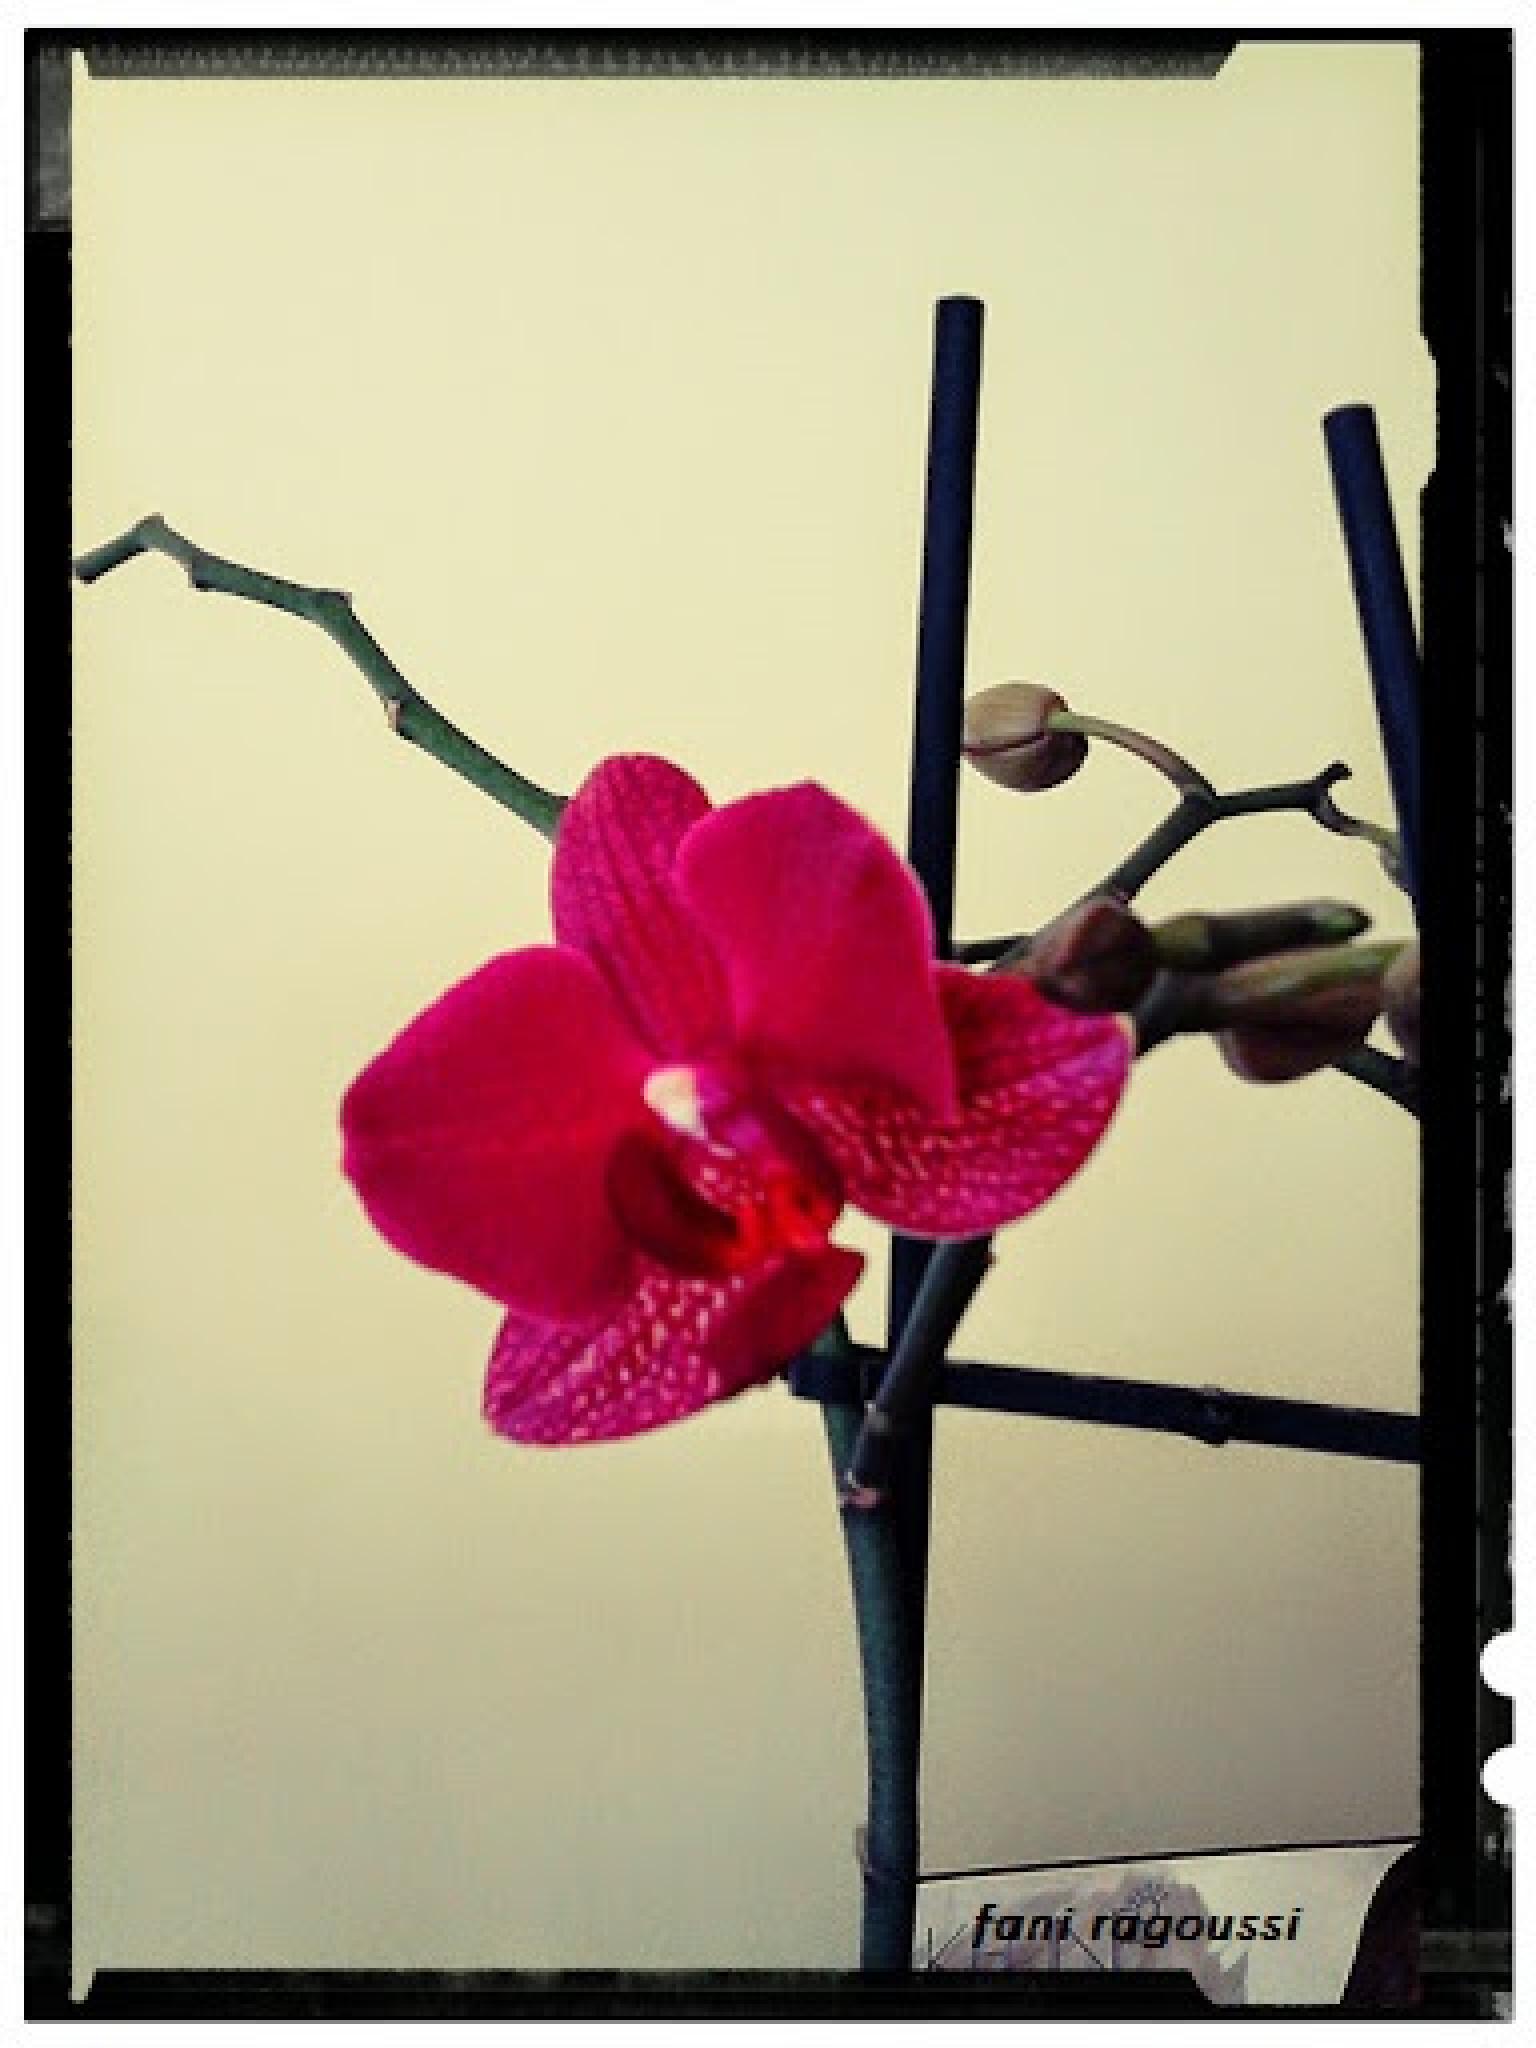 orchideas by fani ragoussi